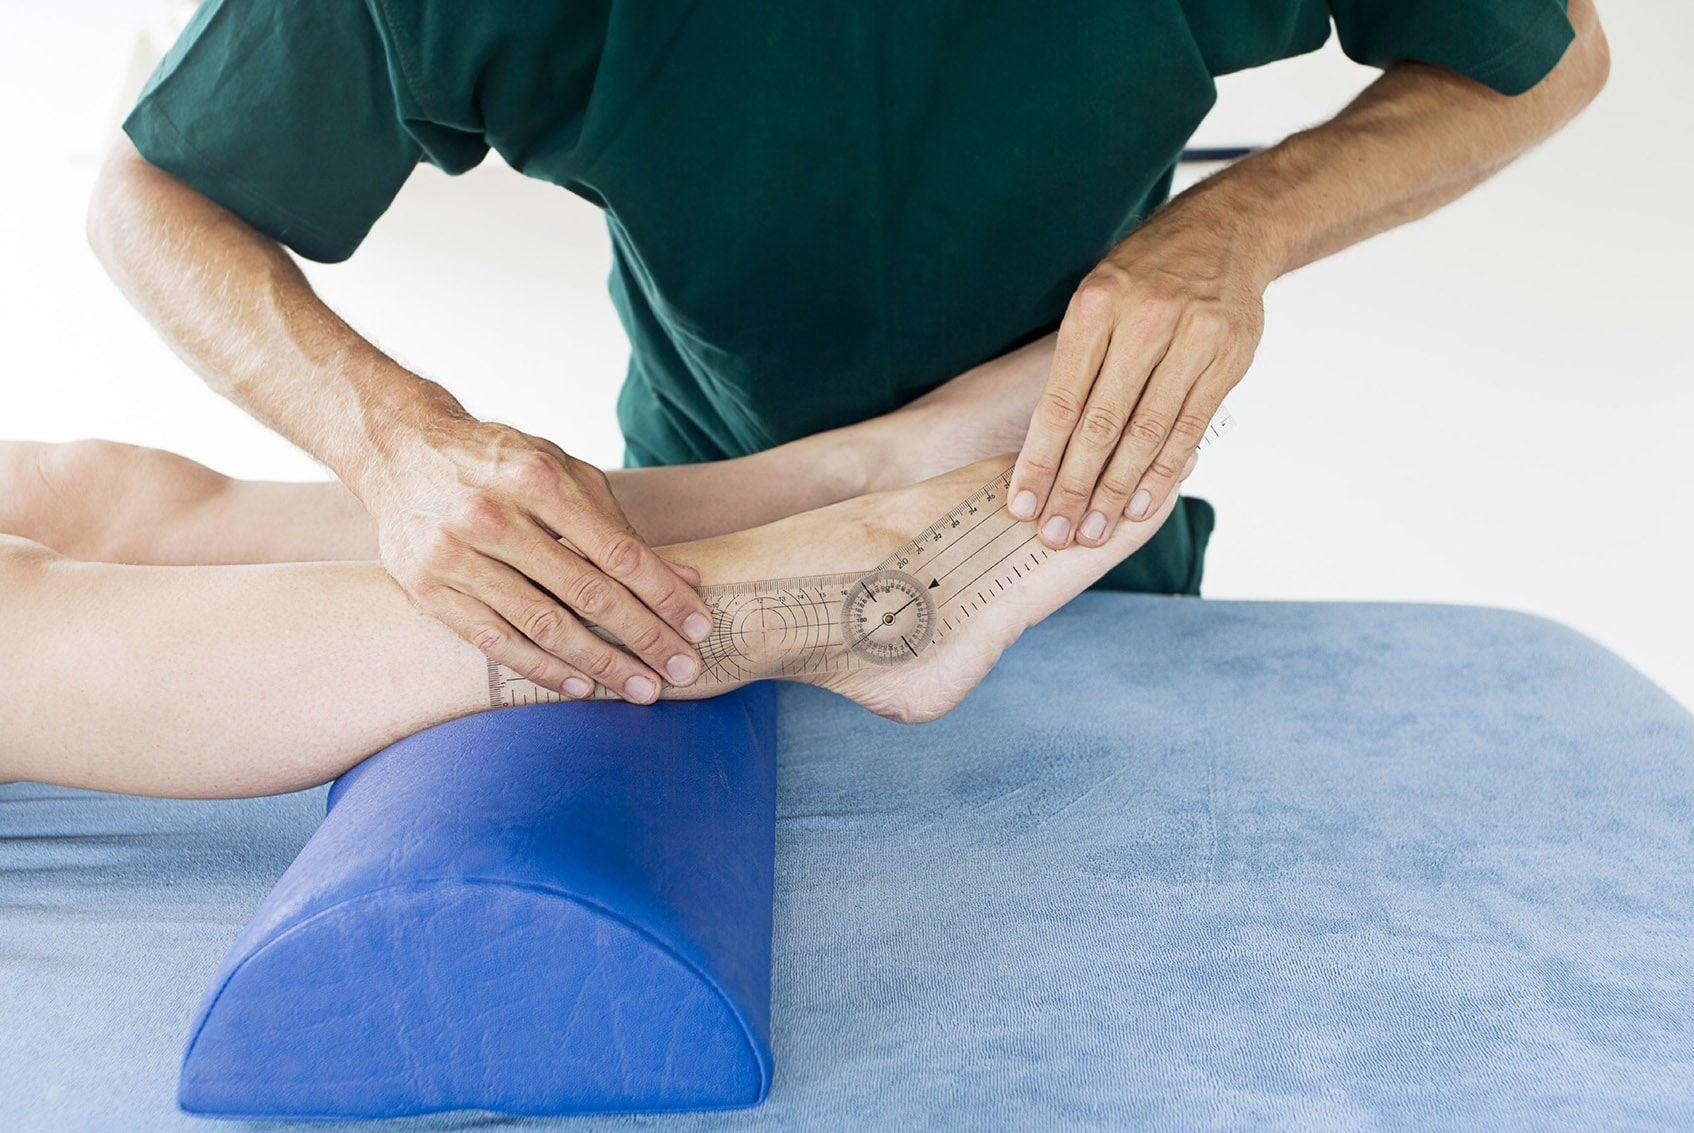 Fisioterapia por cuenta propia